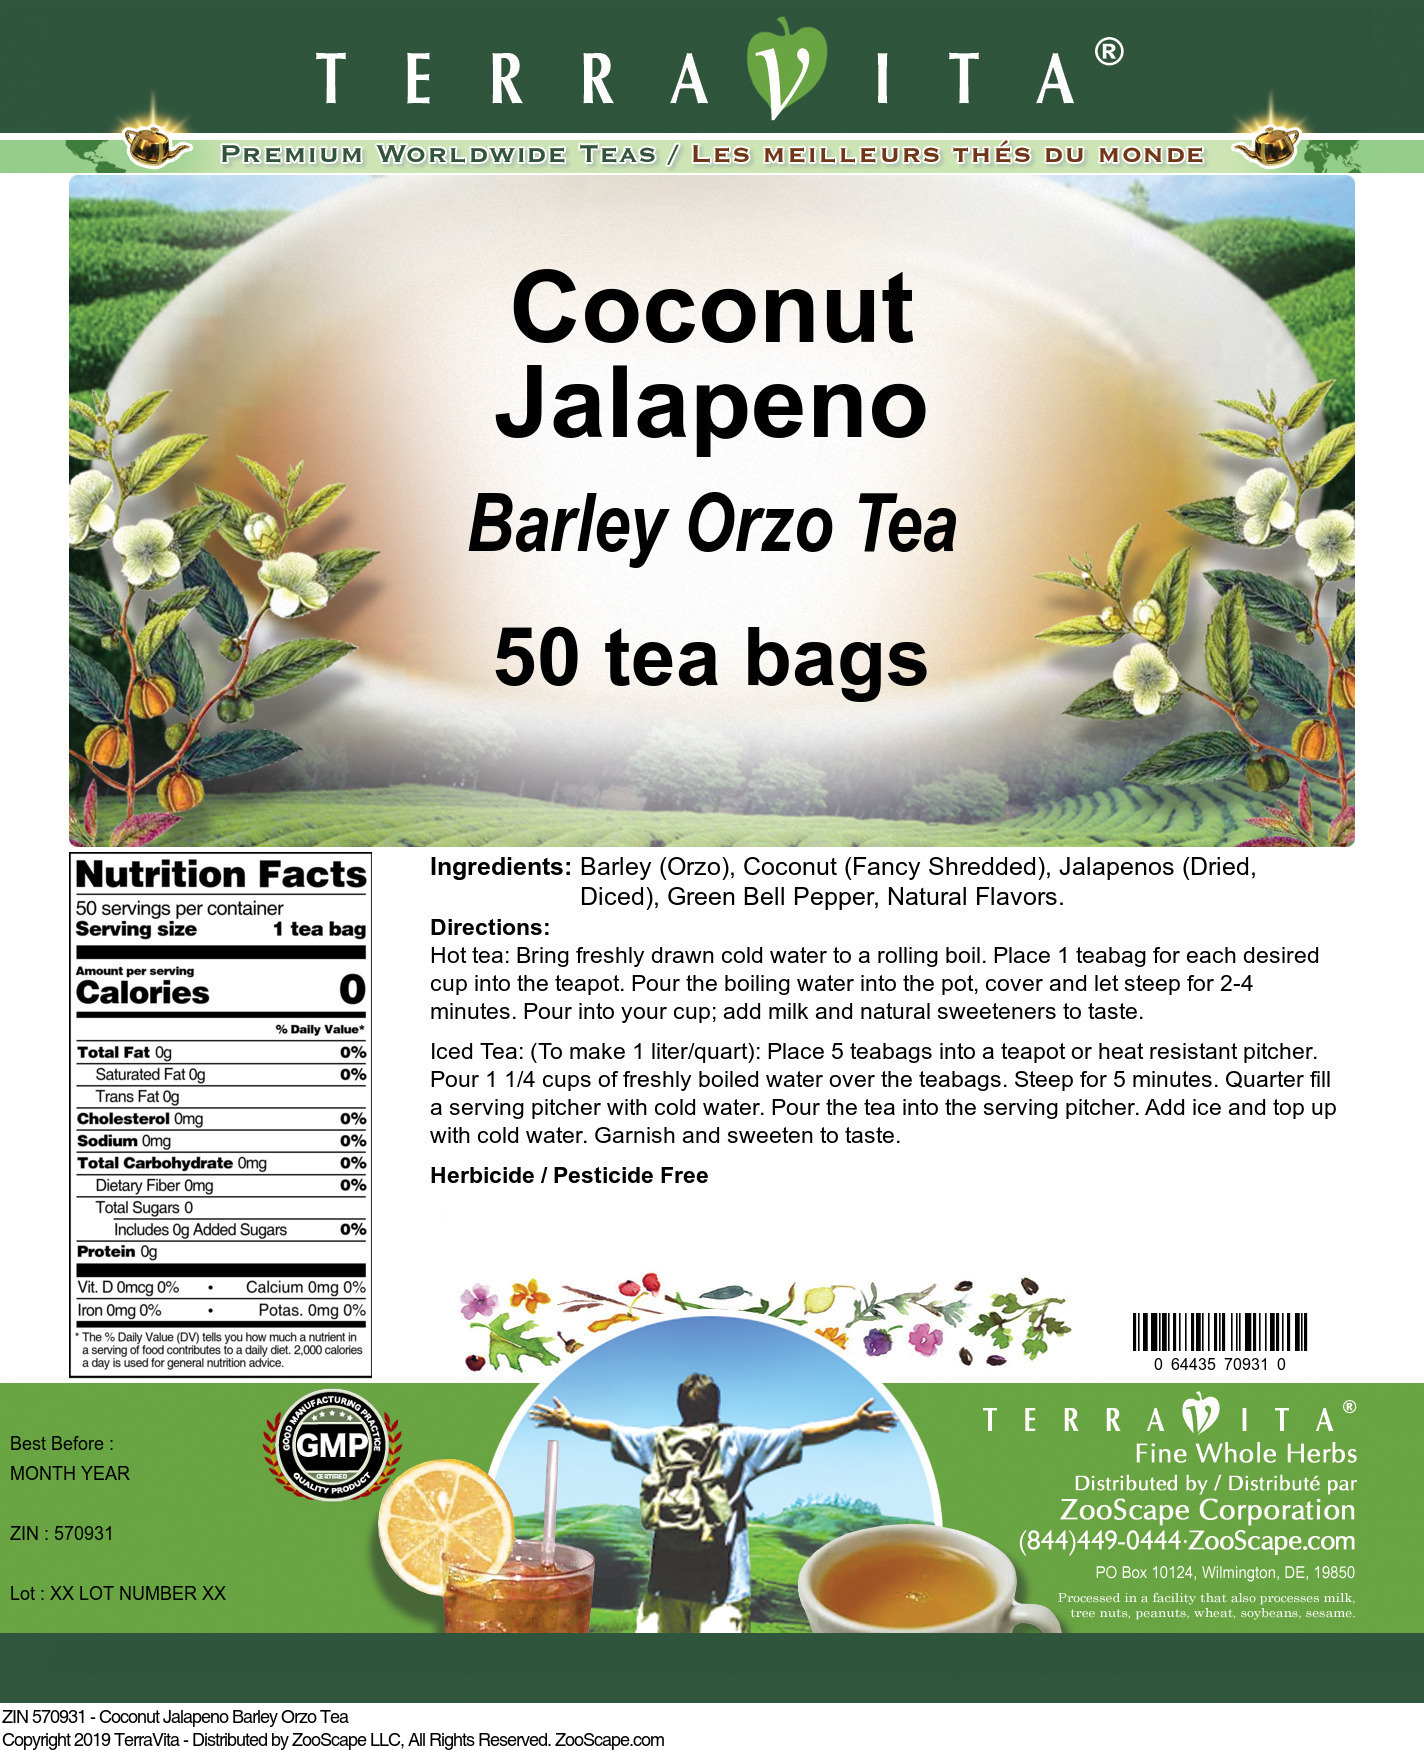 Coconut Jalapeno Barley Orzo Tea